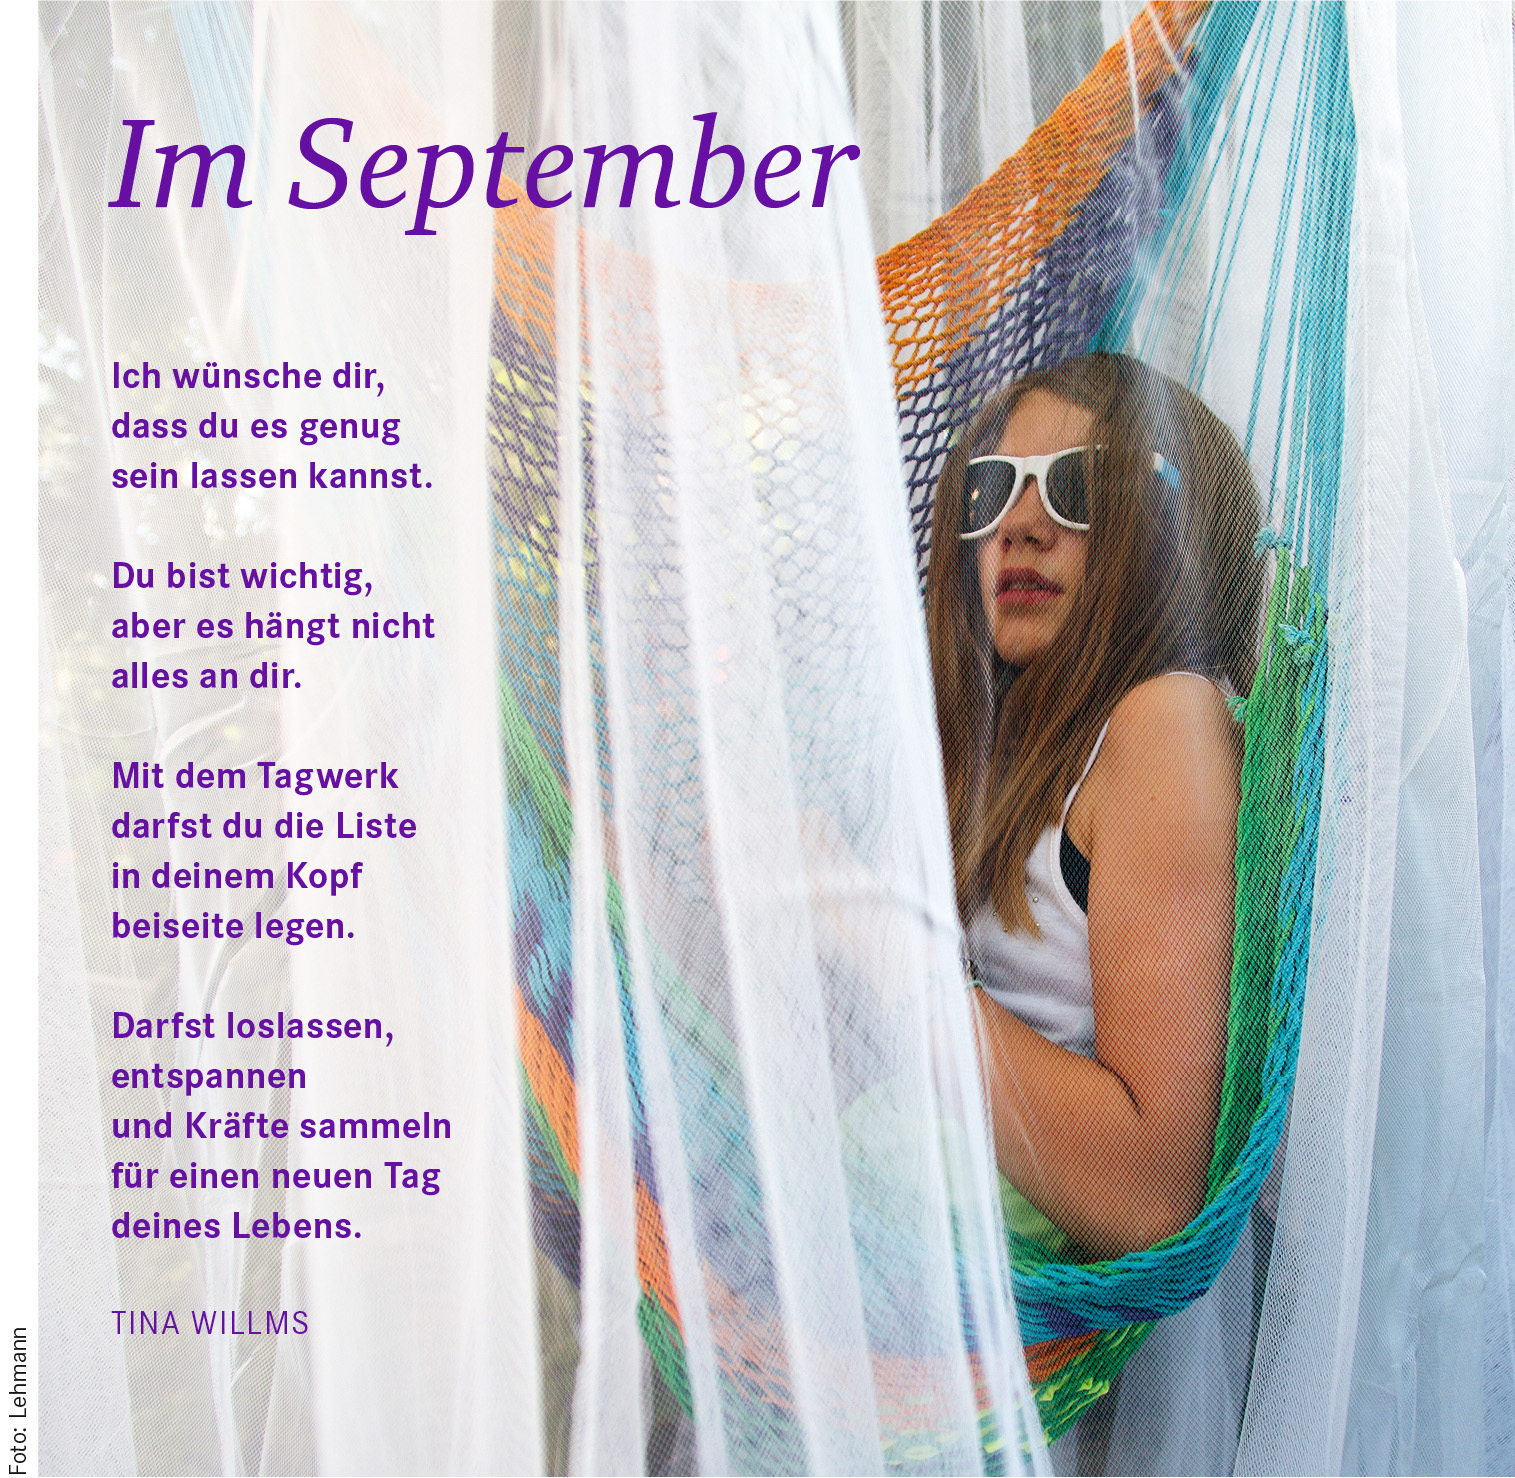 Spruch-09 Im September 165_3802_rgb